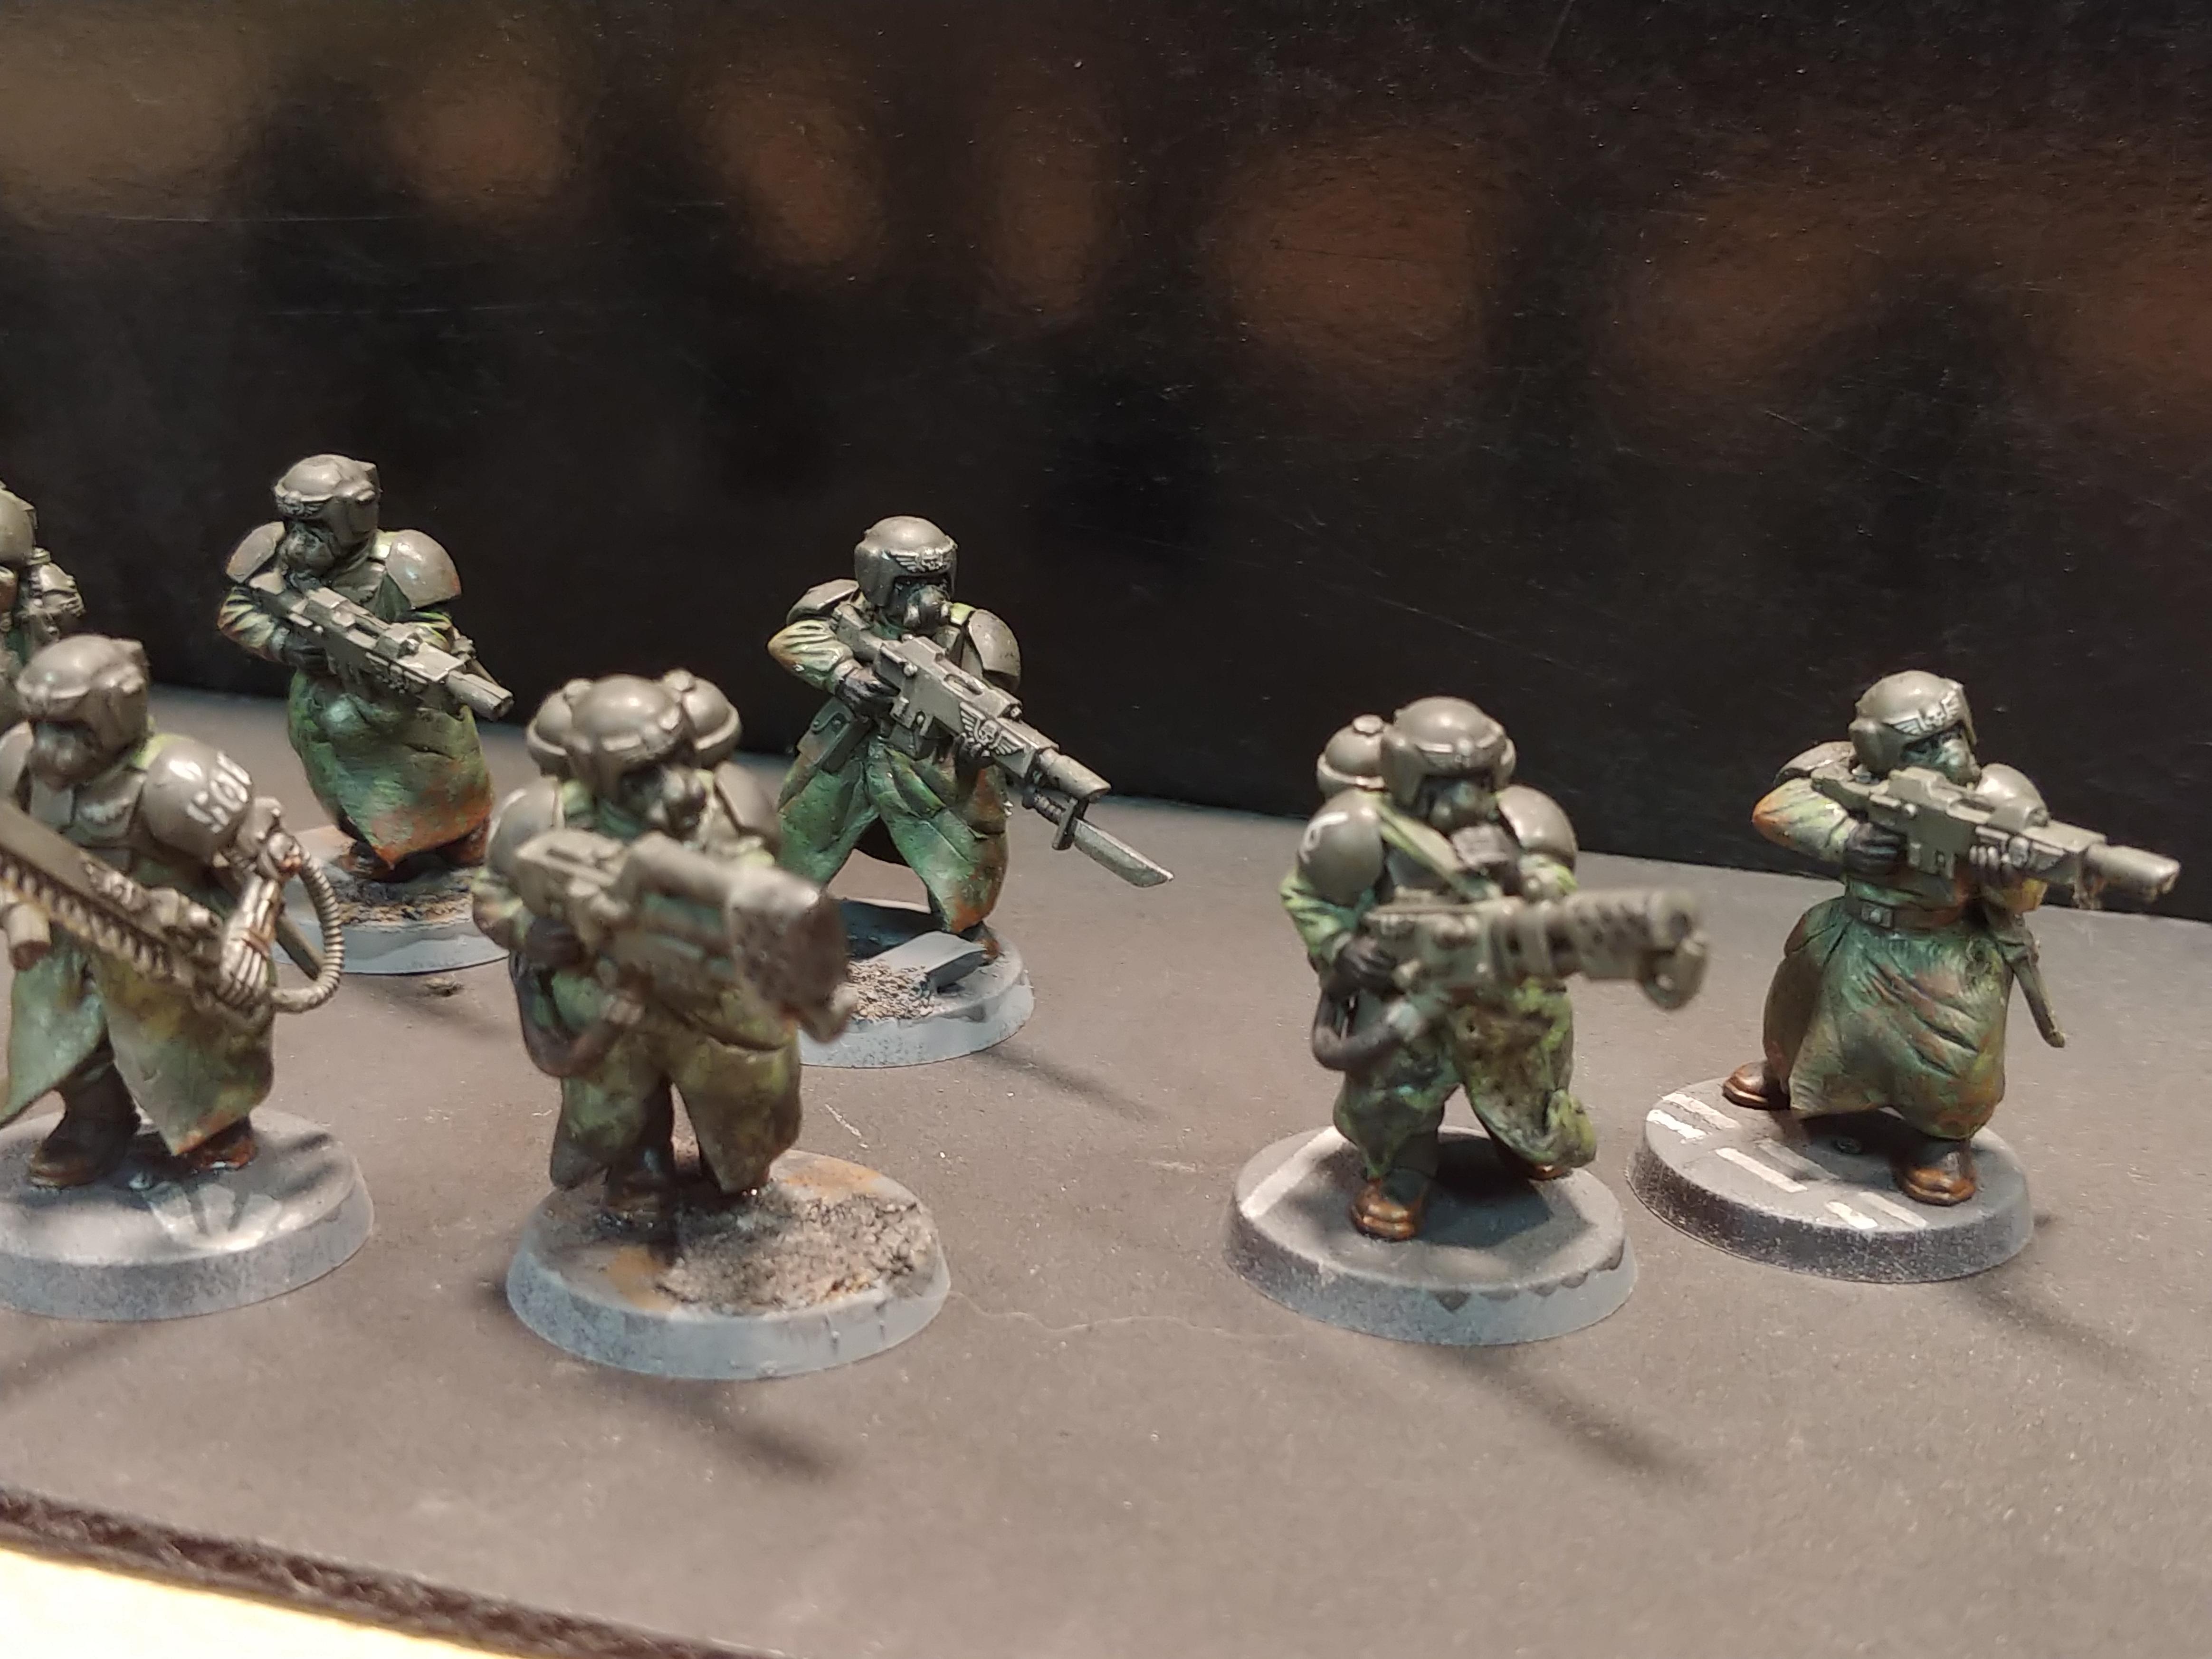 508th, Am, Astra, Flamer, Guard, Guardsmen, Heavy Flamer, Imperial, Imperial Guard, Infantry, Militarum, Veteran, Warhammer 40,000, Warhammer Fantasy